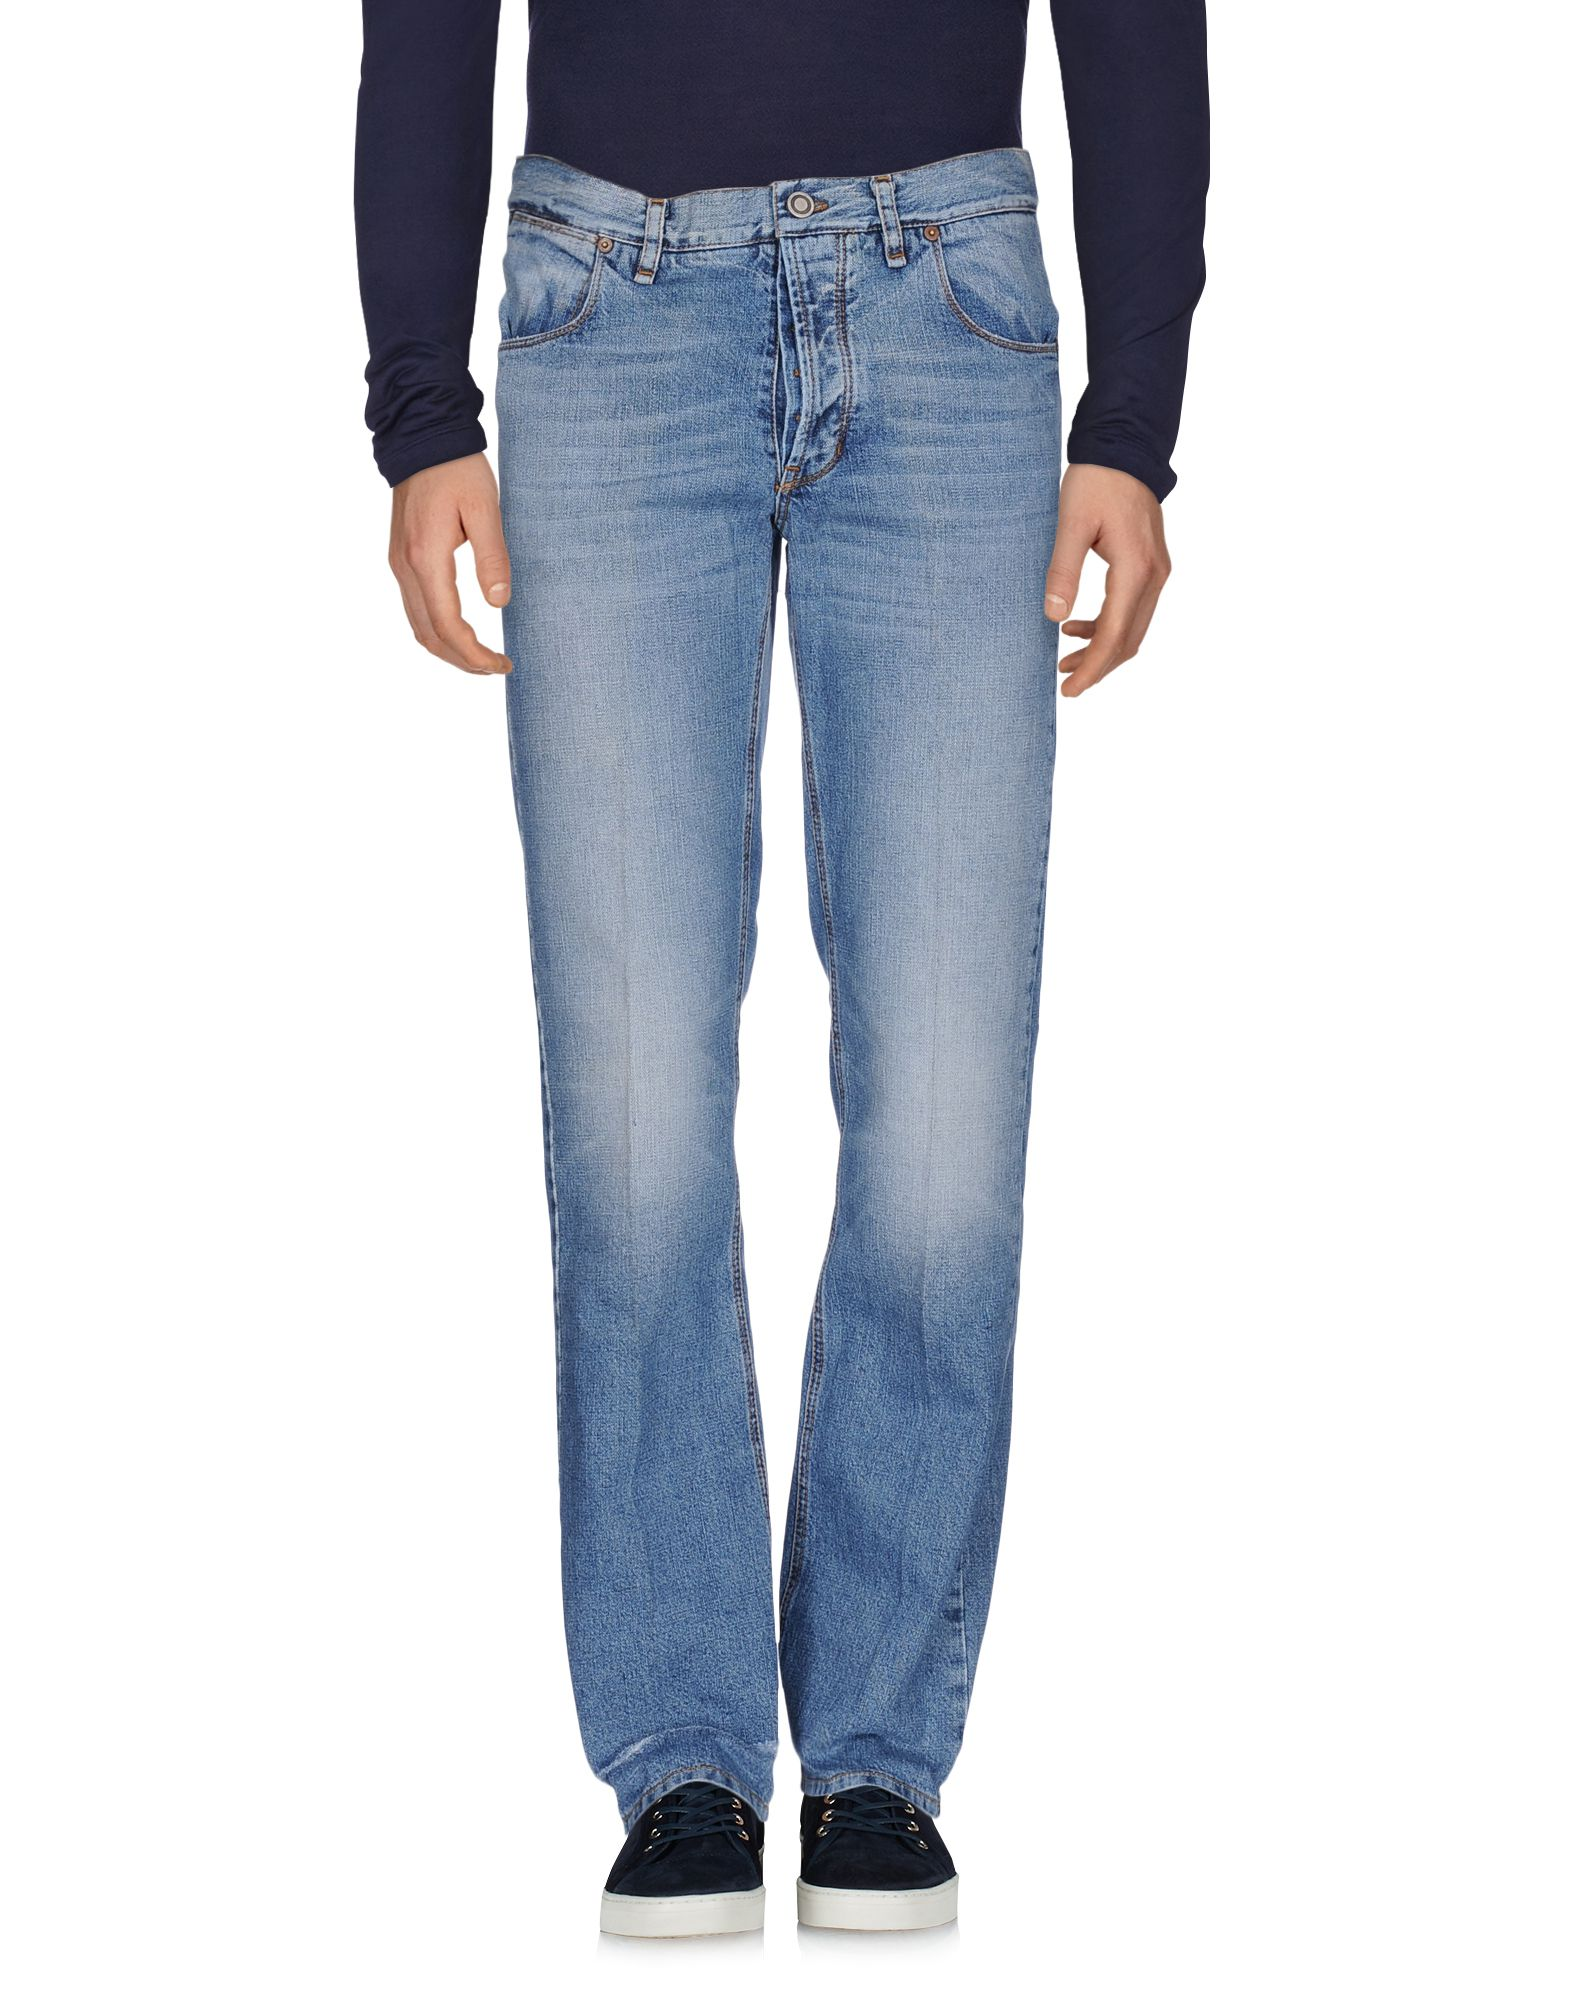 Pantaloni Jeans oroen Goose Goose oroen Deluxe Brand Uomo - 42616614UW 177315